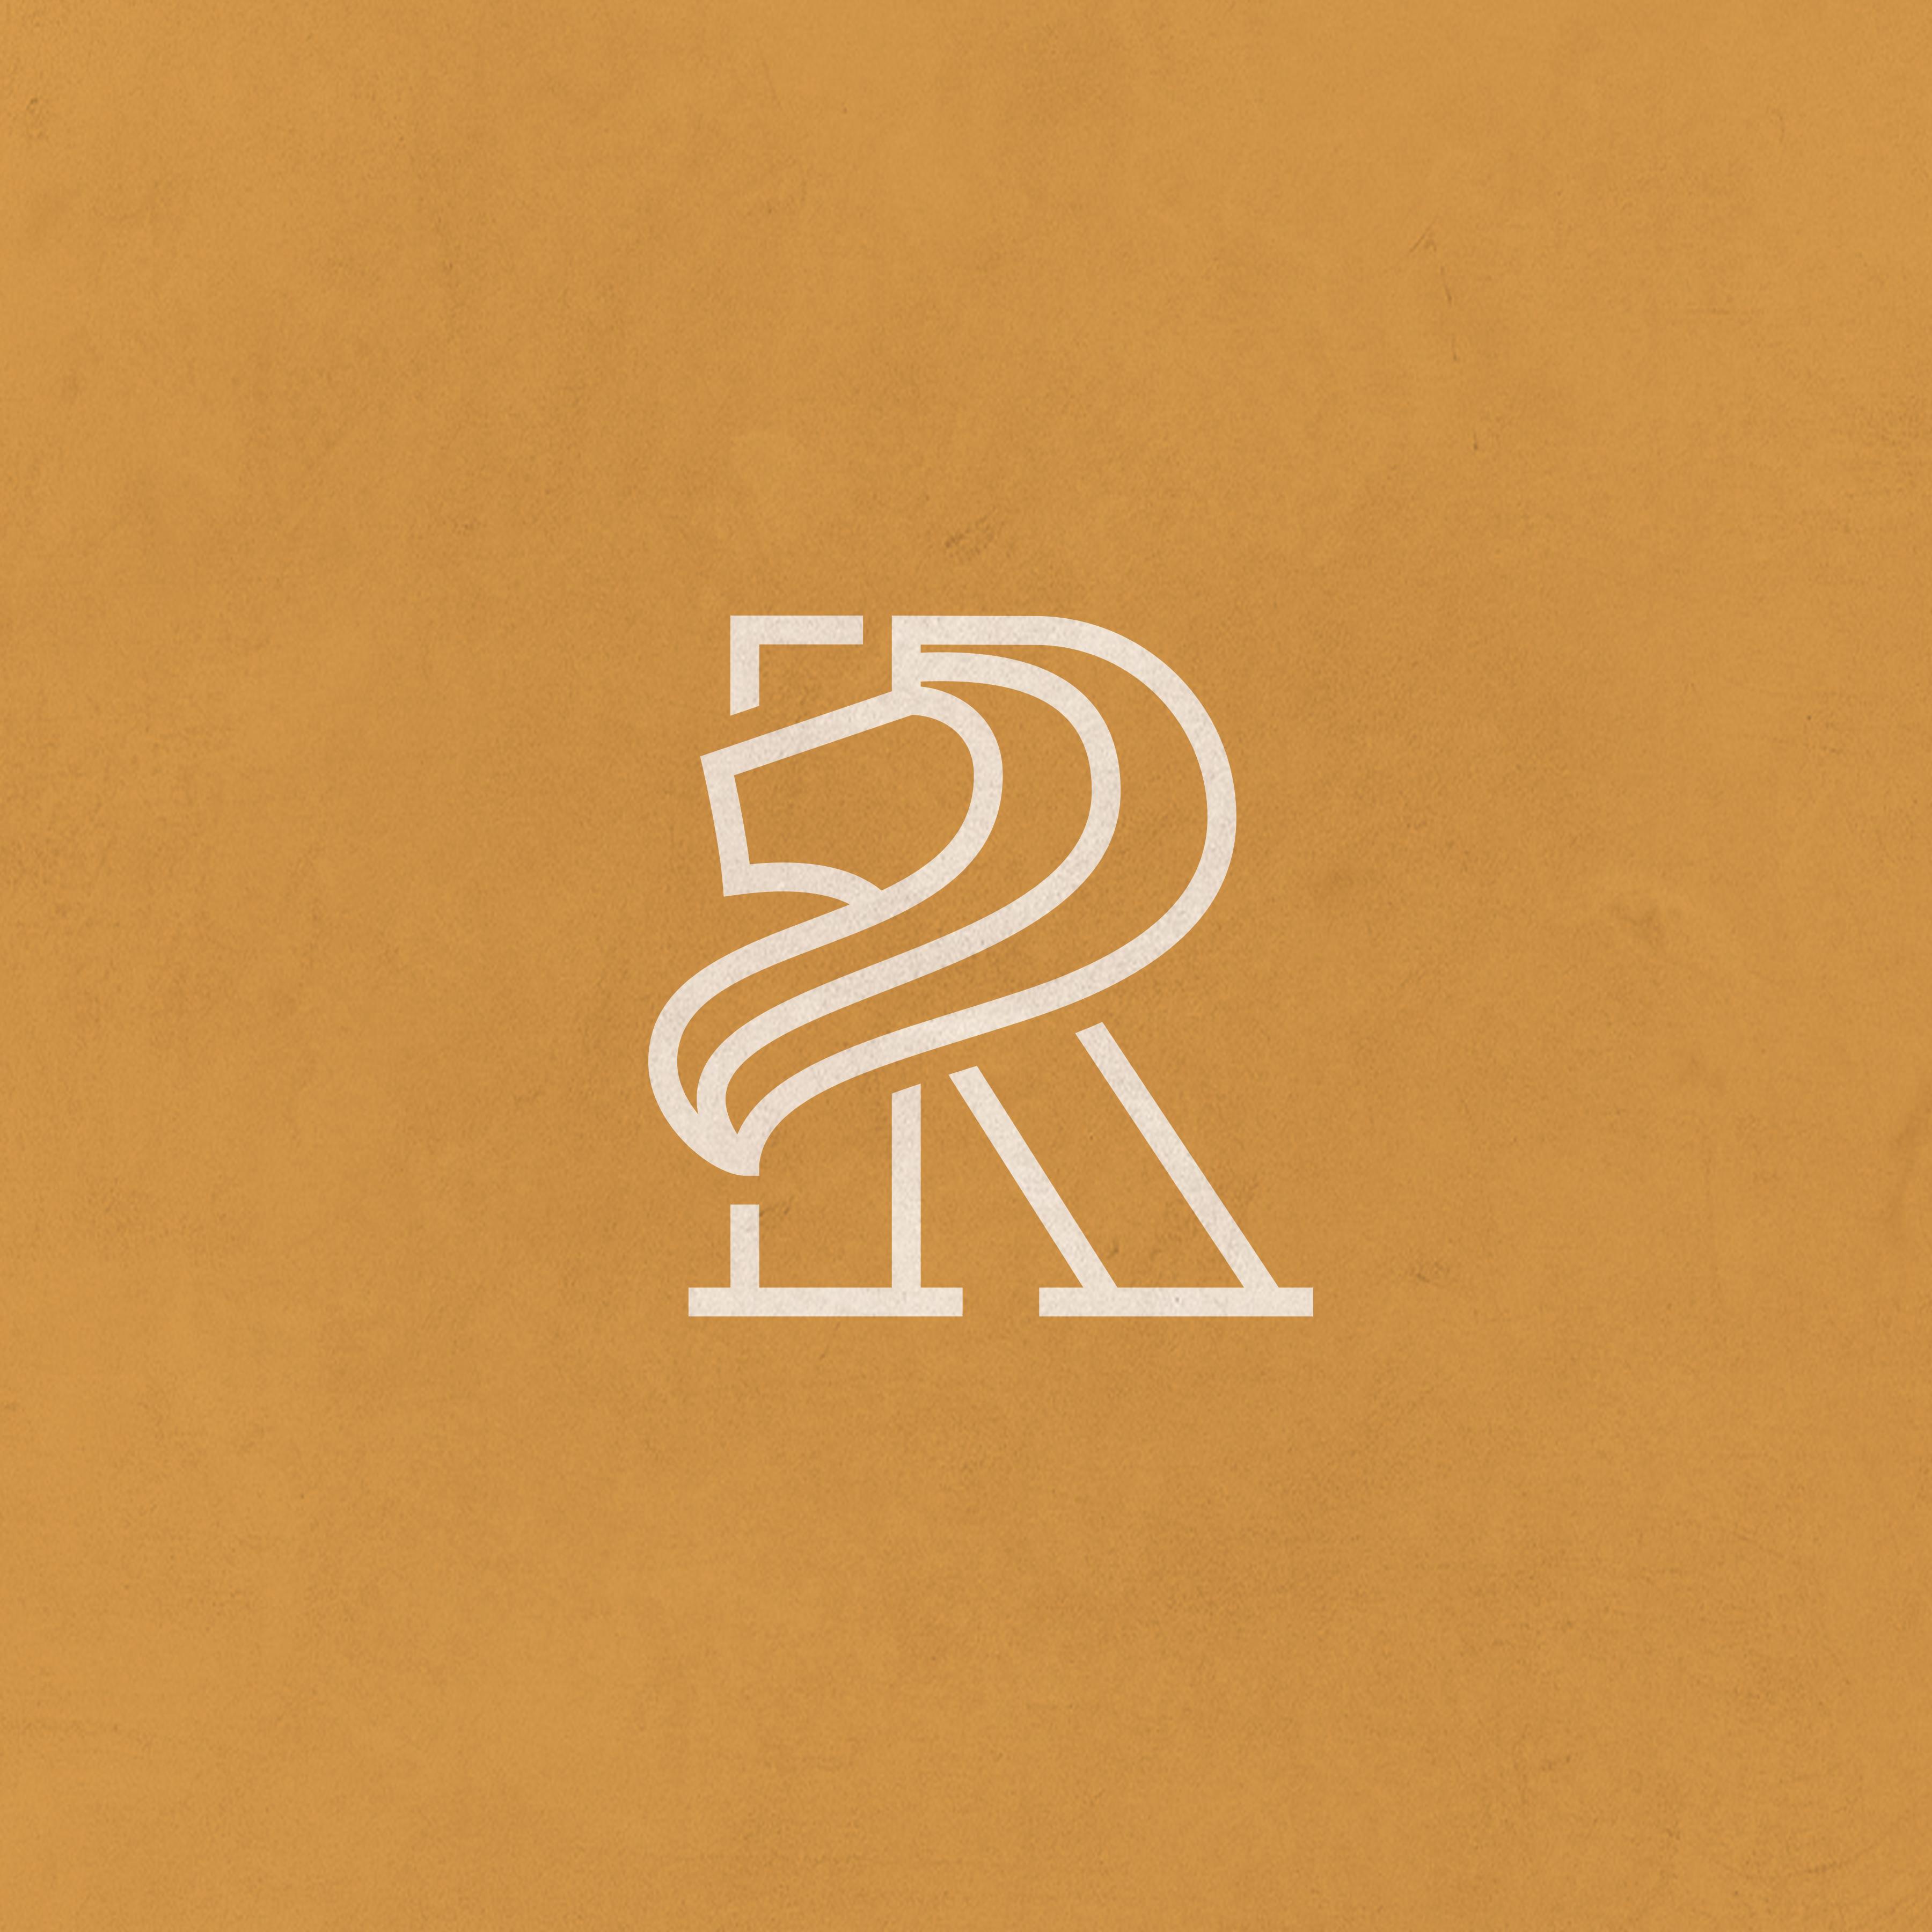 ANerdsWorld_Logos_Regiani